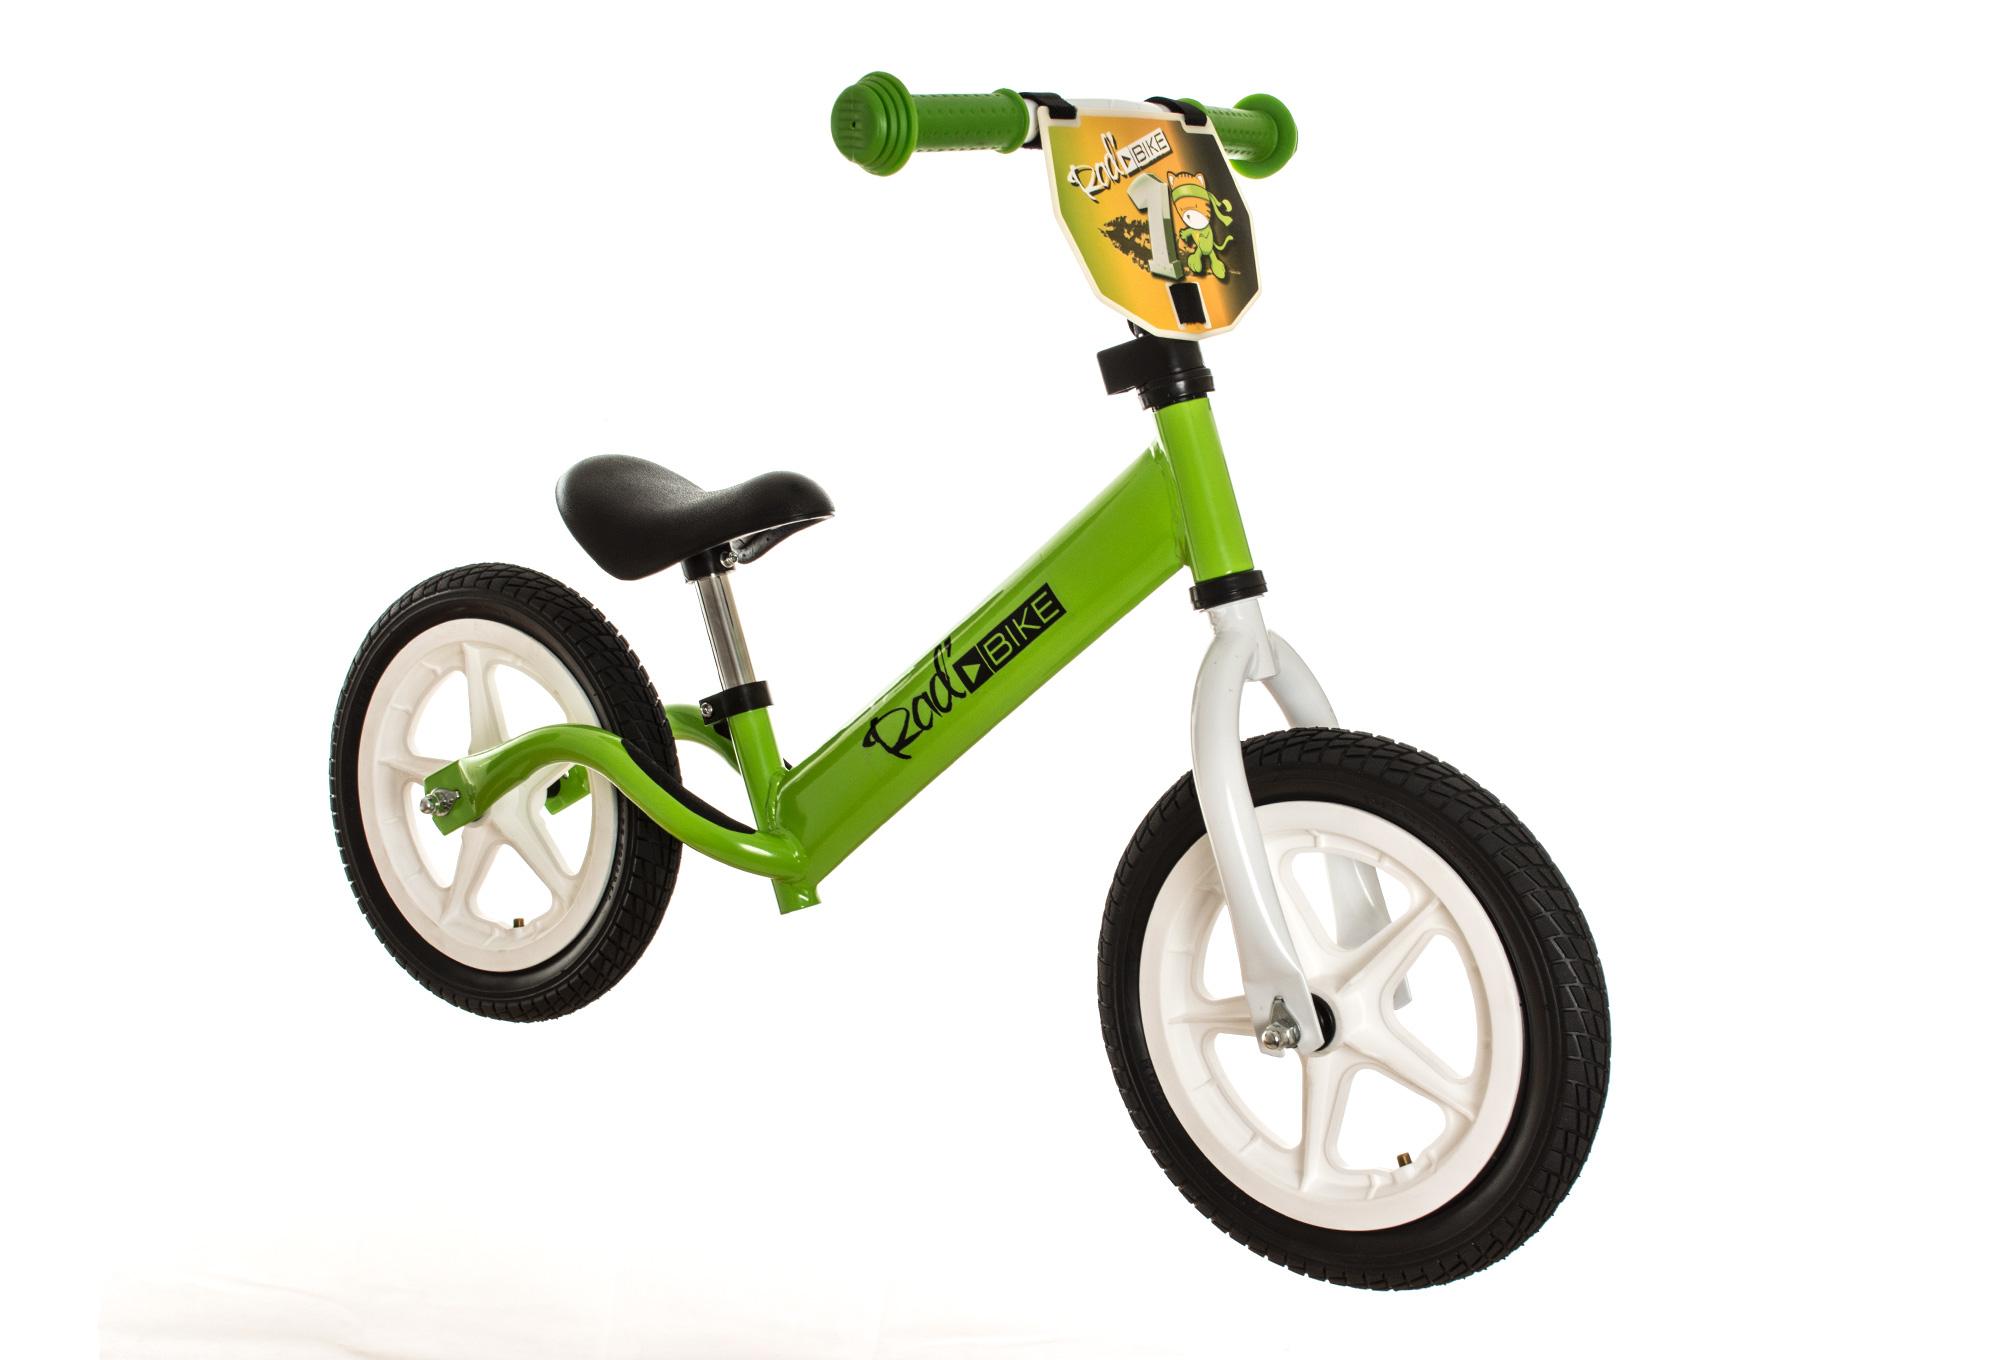 rad bike push bike 12 39 39 2 3 years green. Black Bedroom Furniture Sets. Home Design Ideas